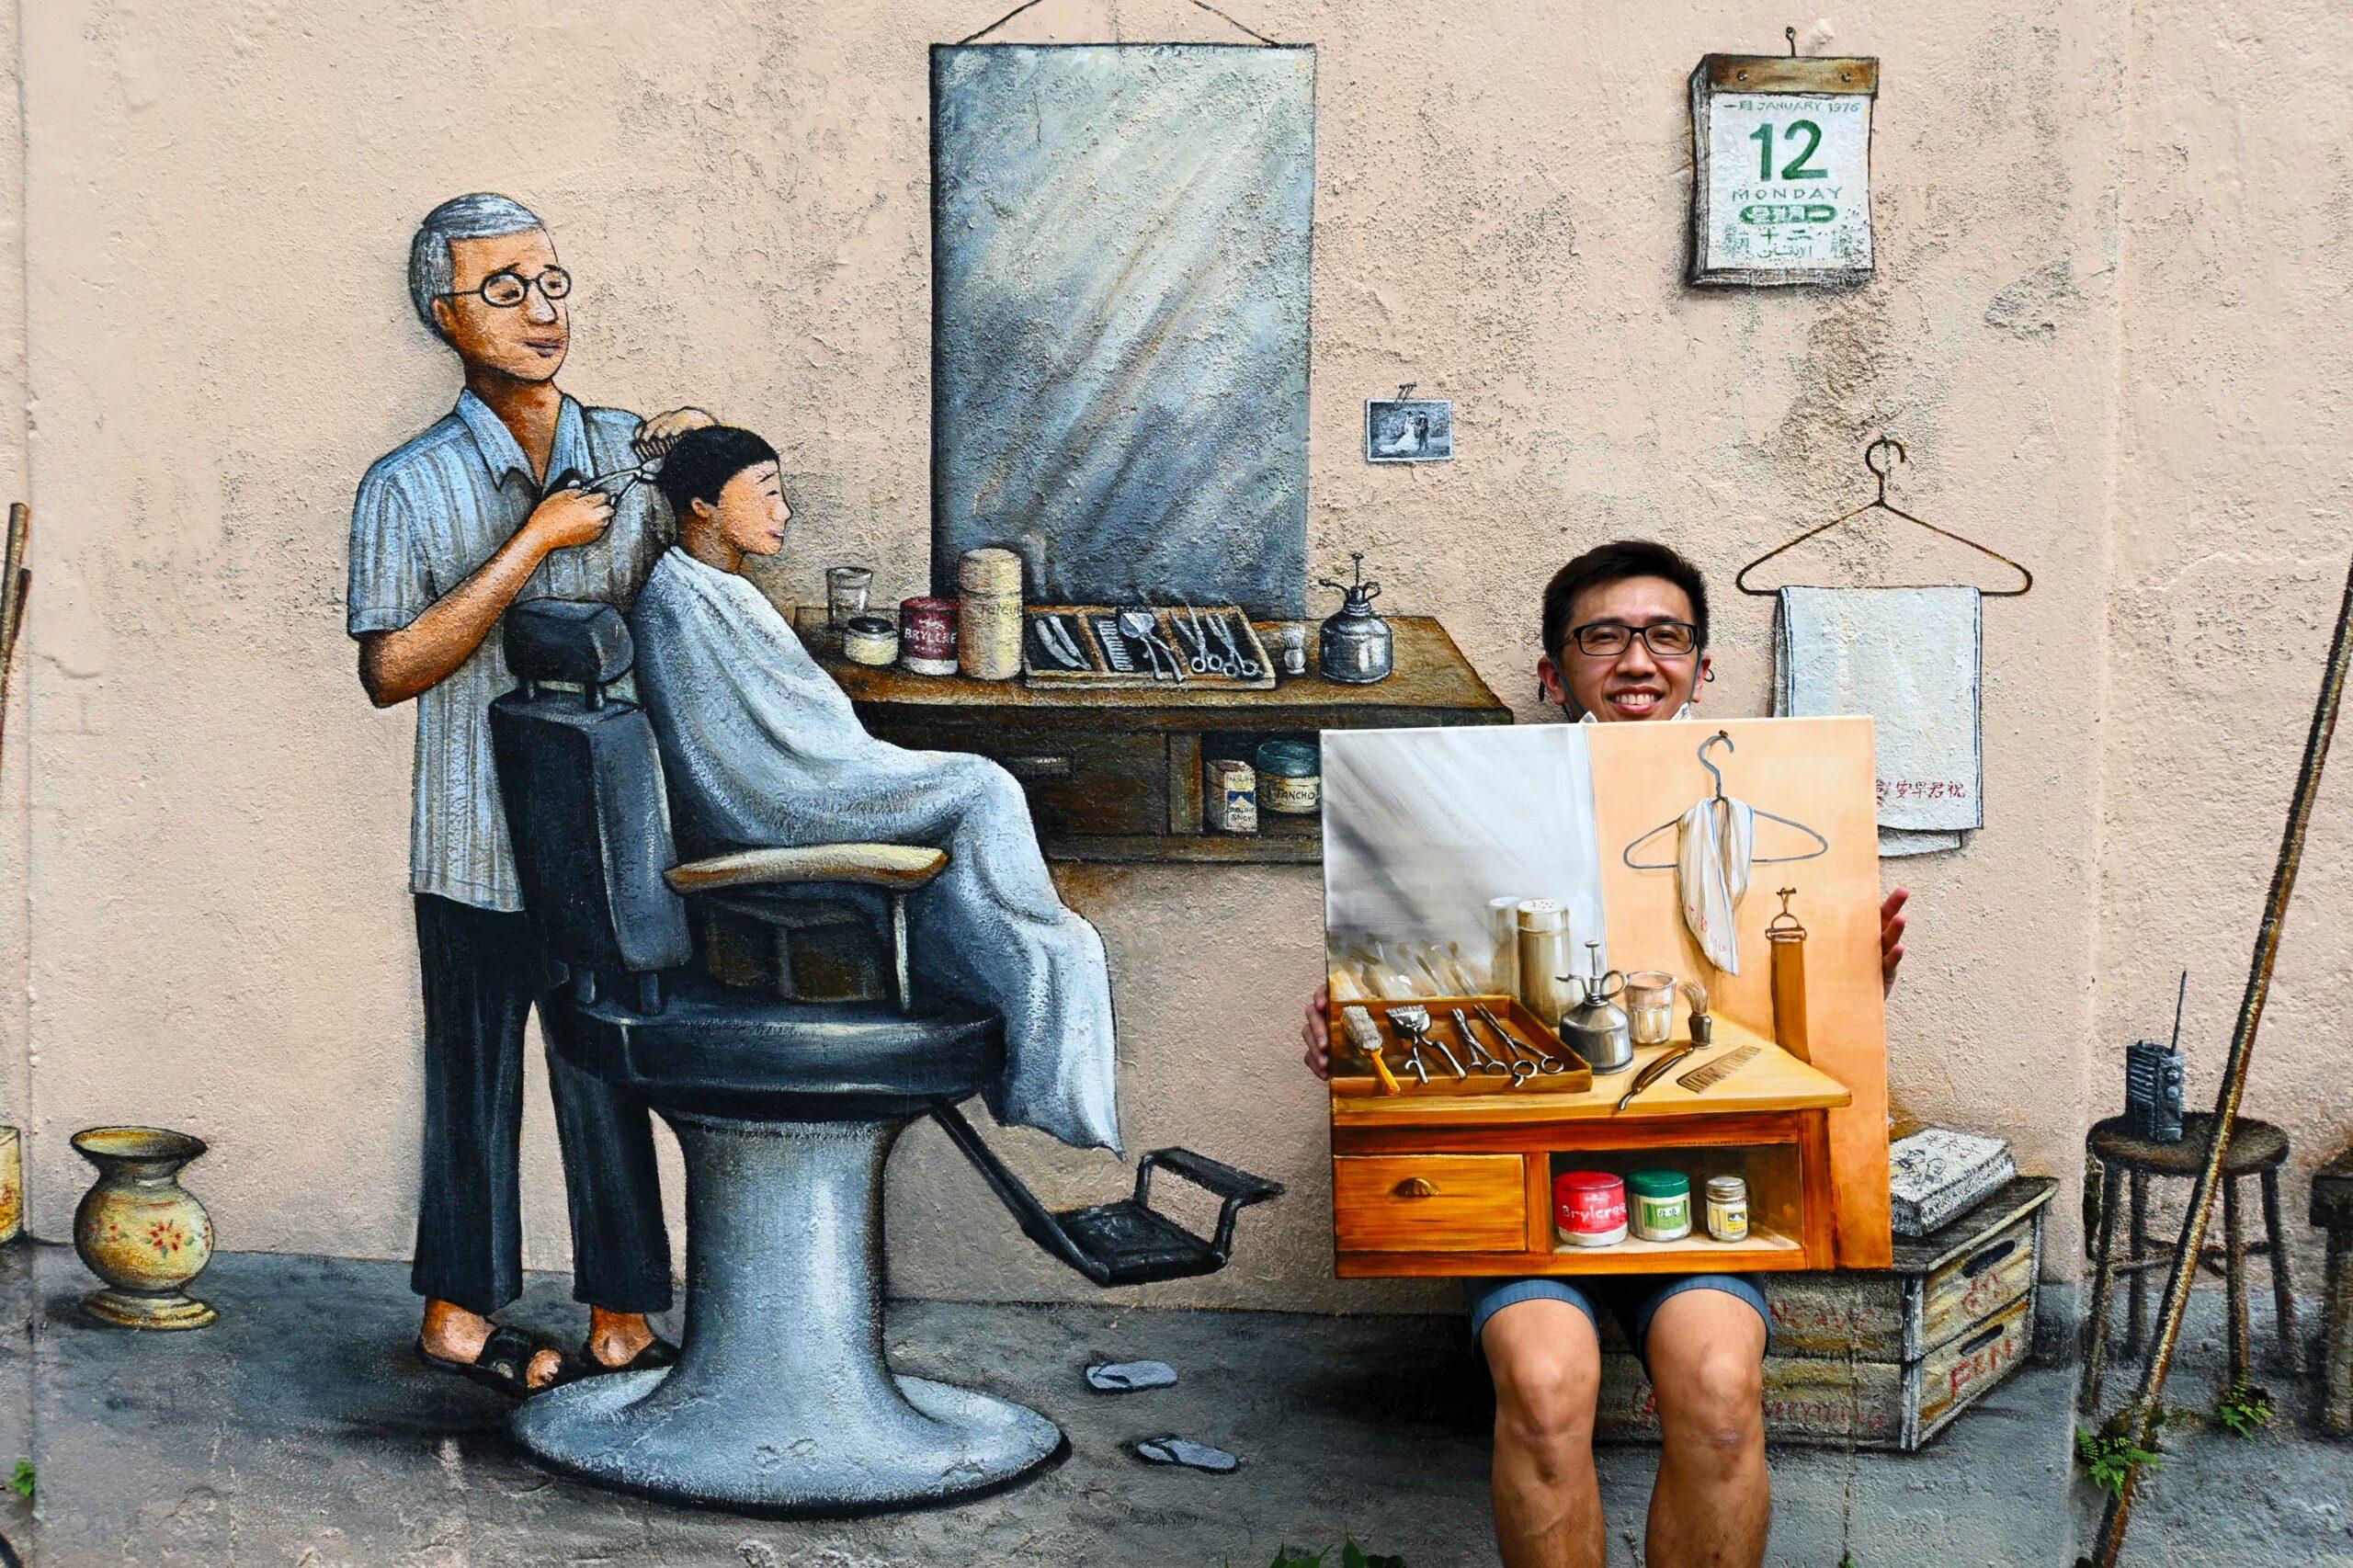 Singapore Street Artist, Yip Yew Chong